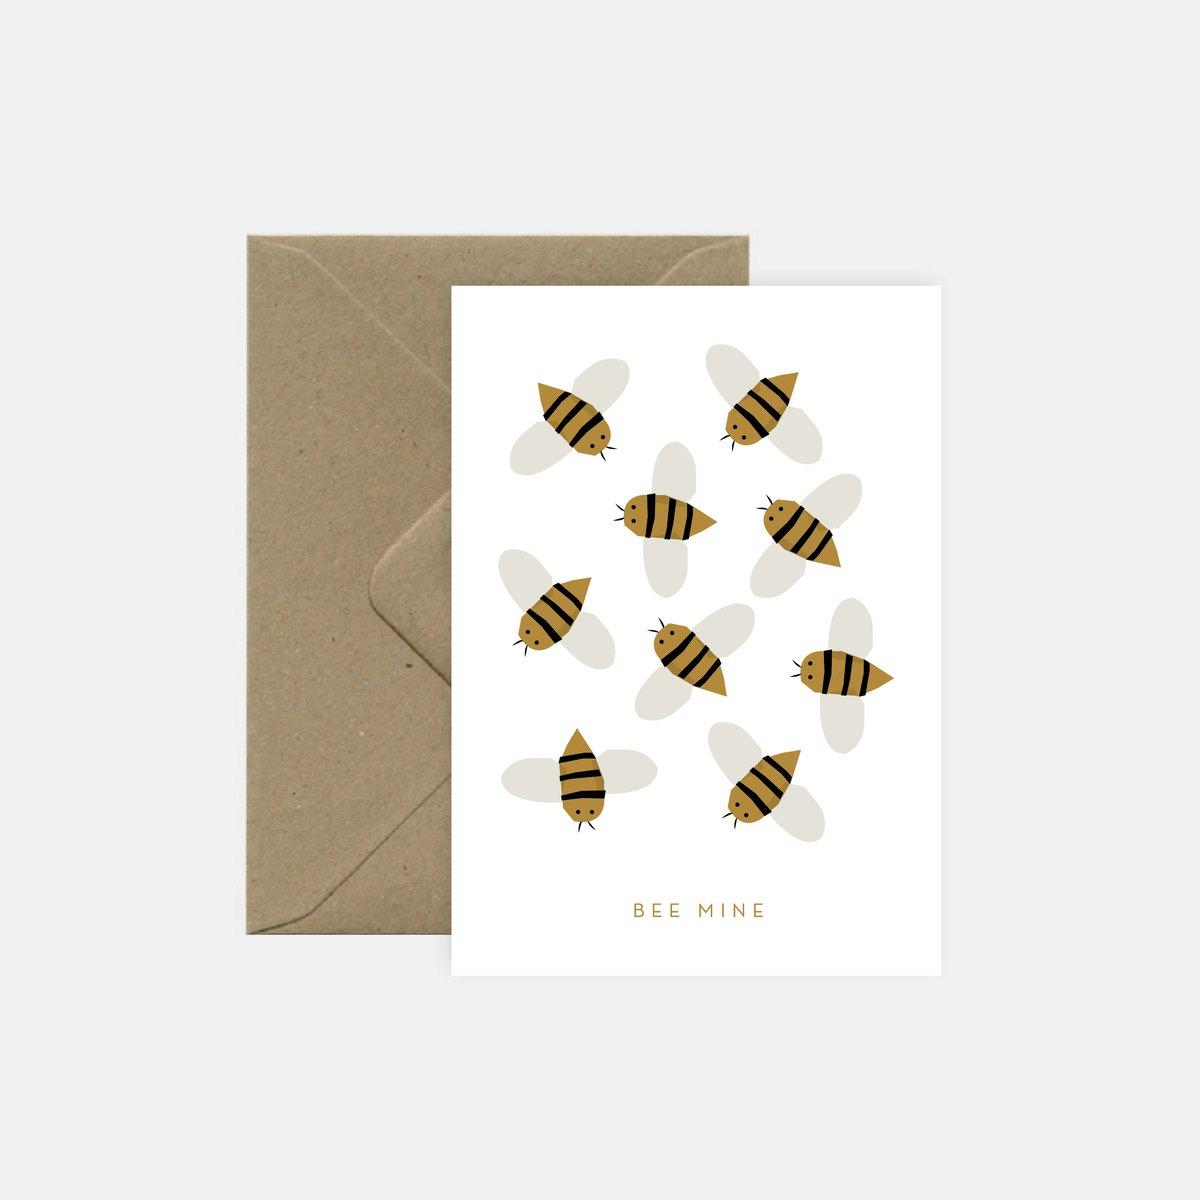 Image of Bee mine